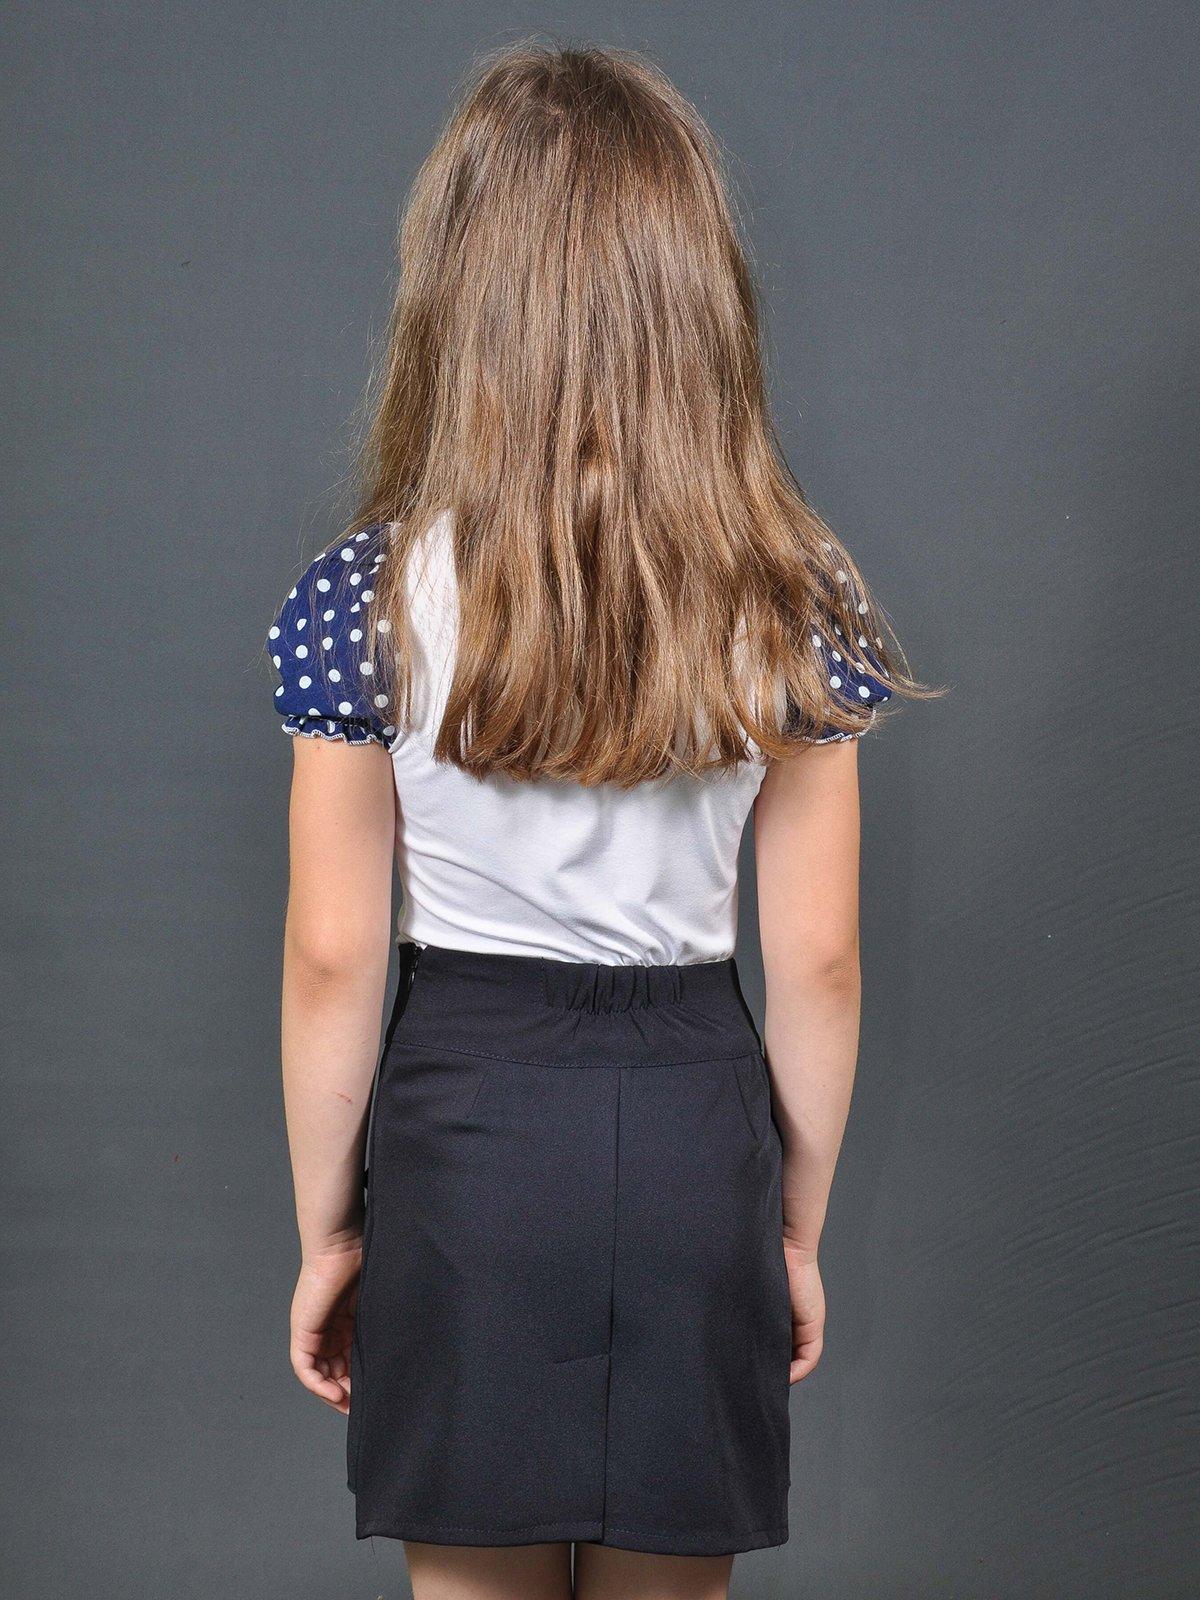 Блуза біло-синя в горошок   3468494   фото 2